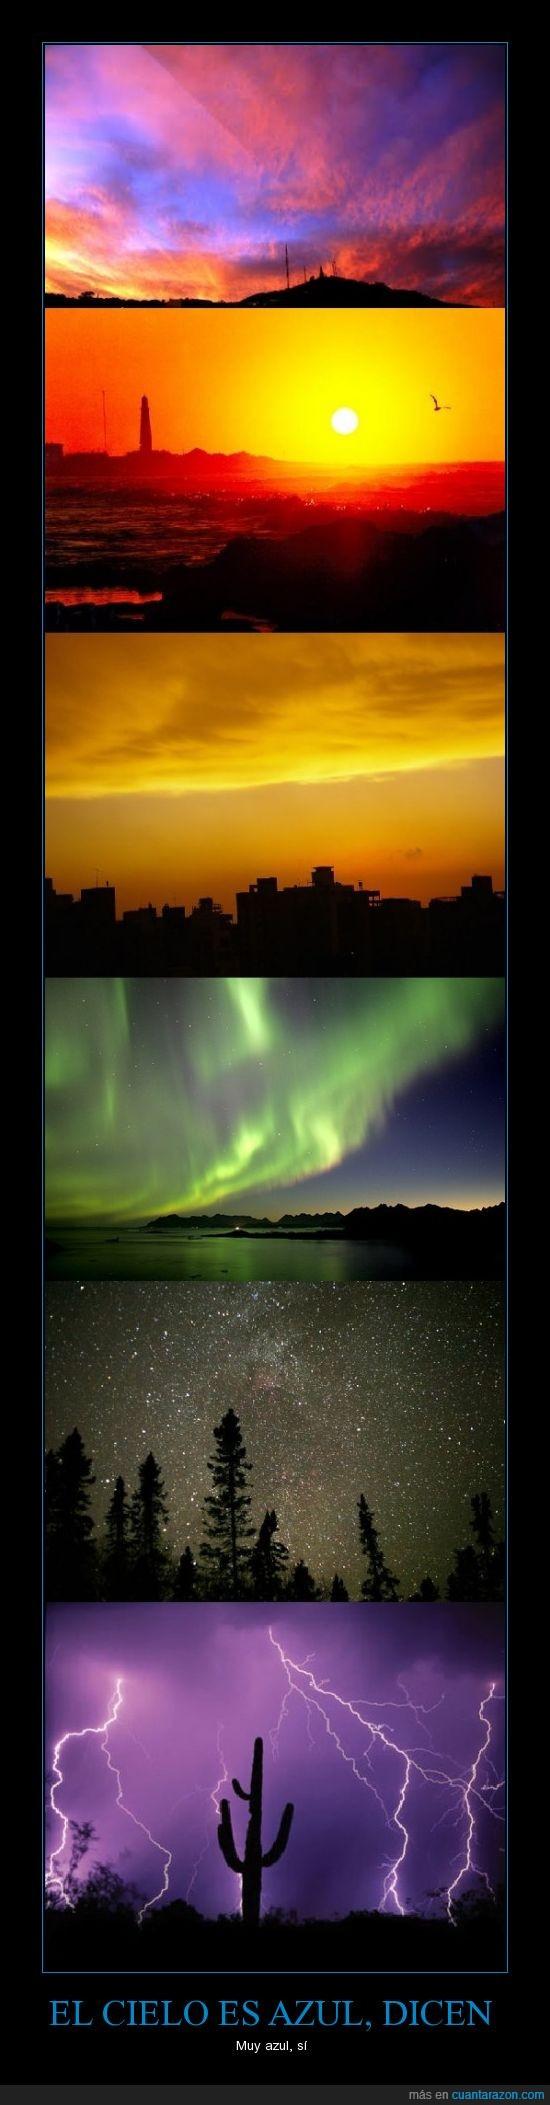 azul,cielo,colores,horizonte,relámpagos